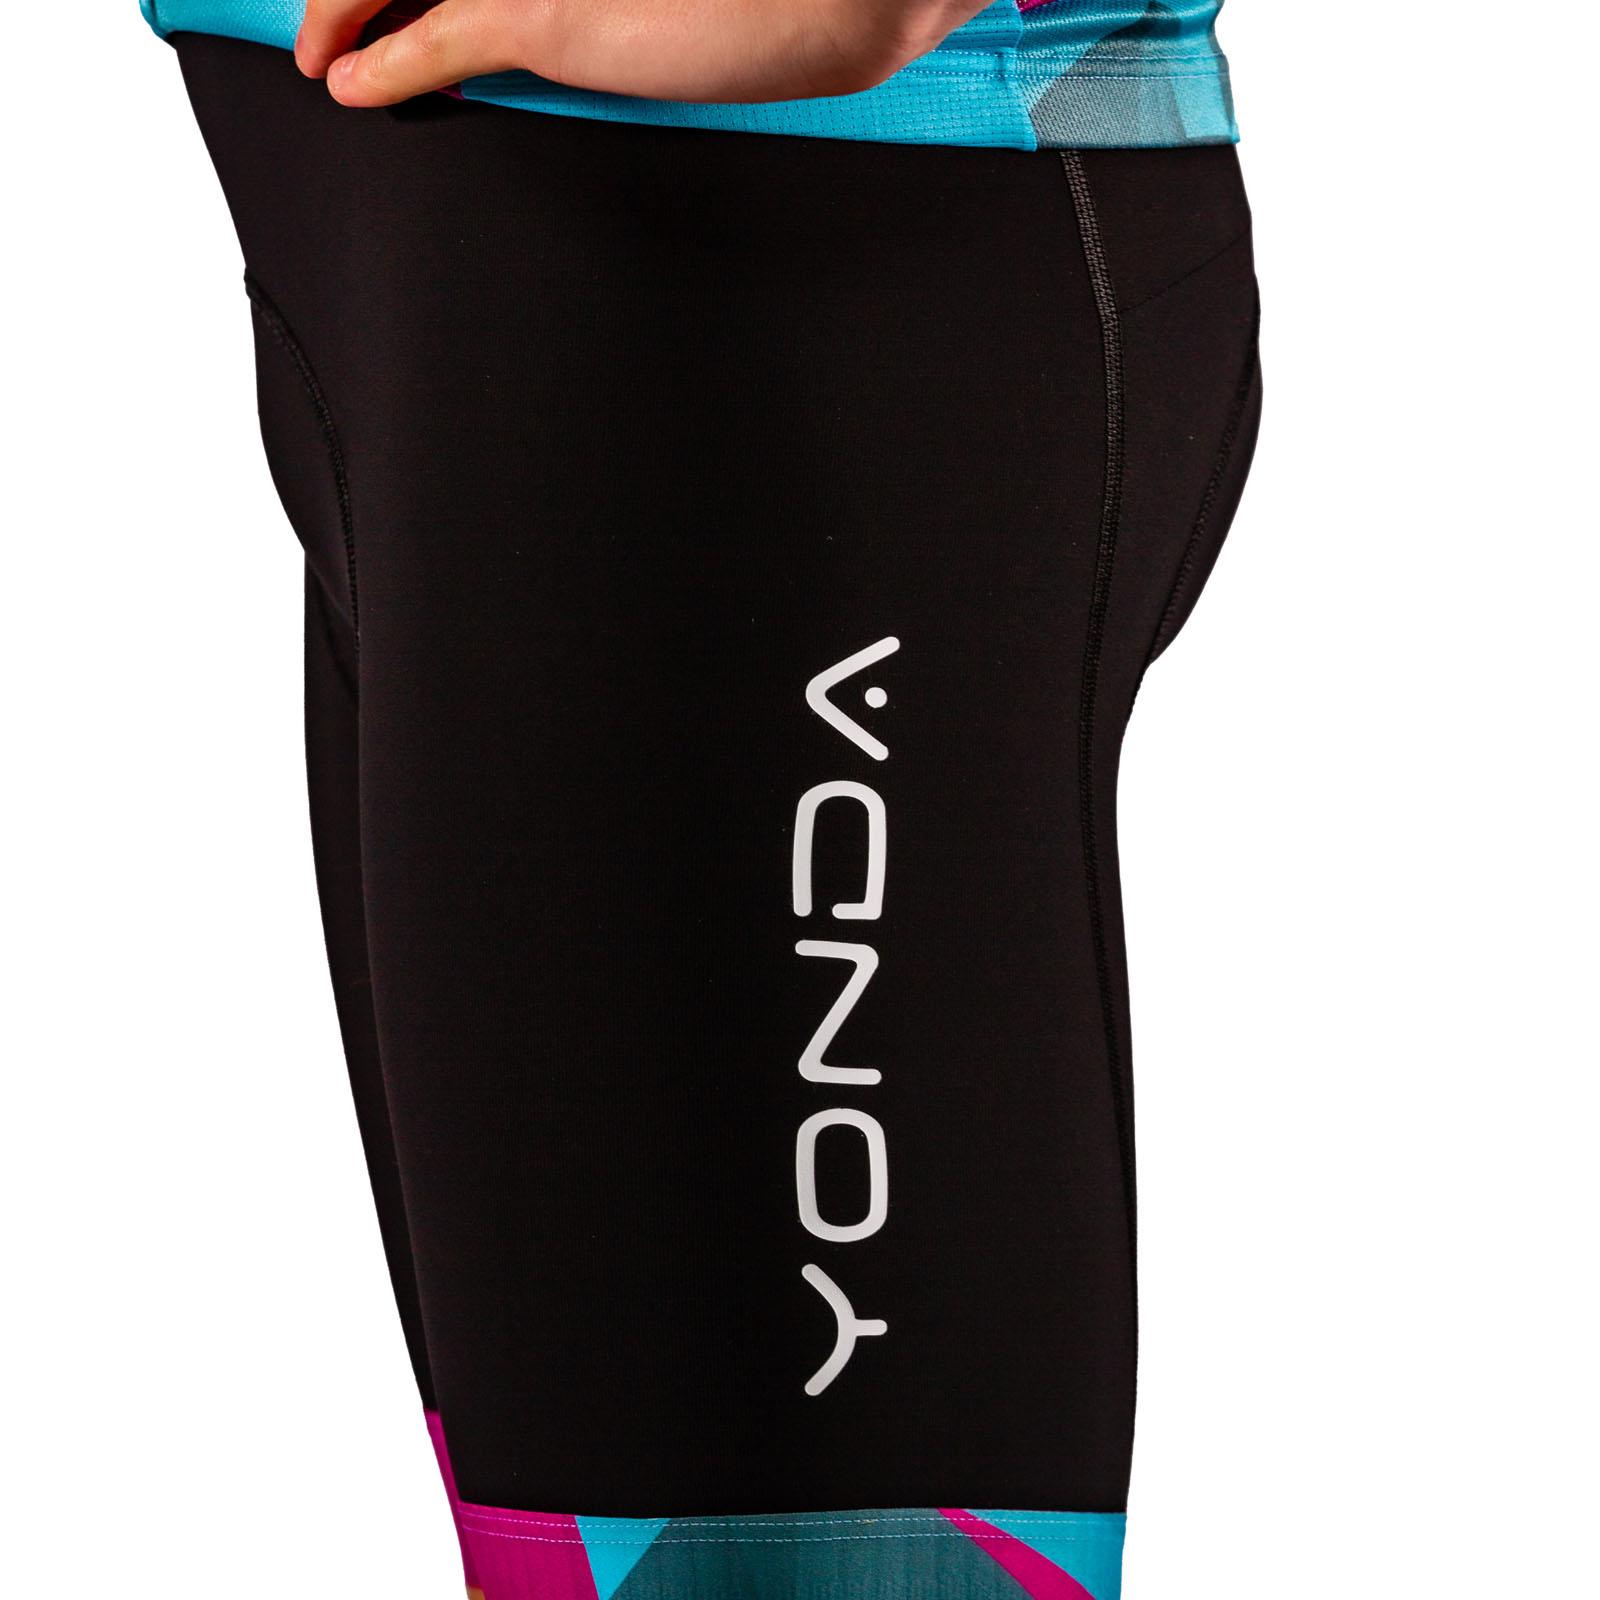 Astratto Blu Premium Bib Shorts - Men's